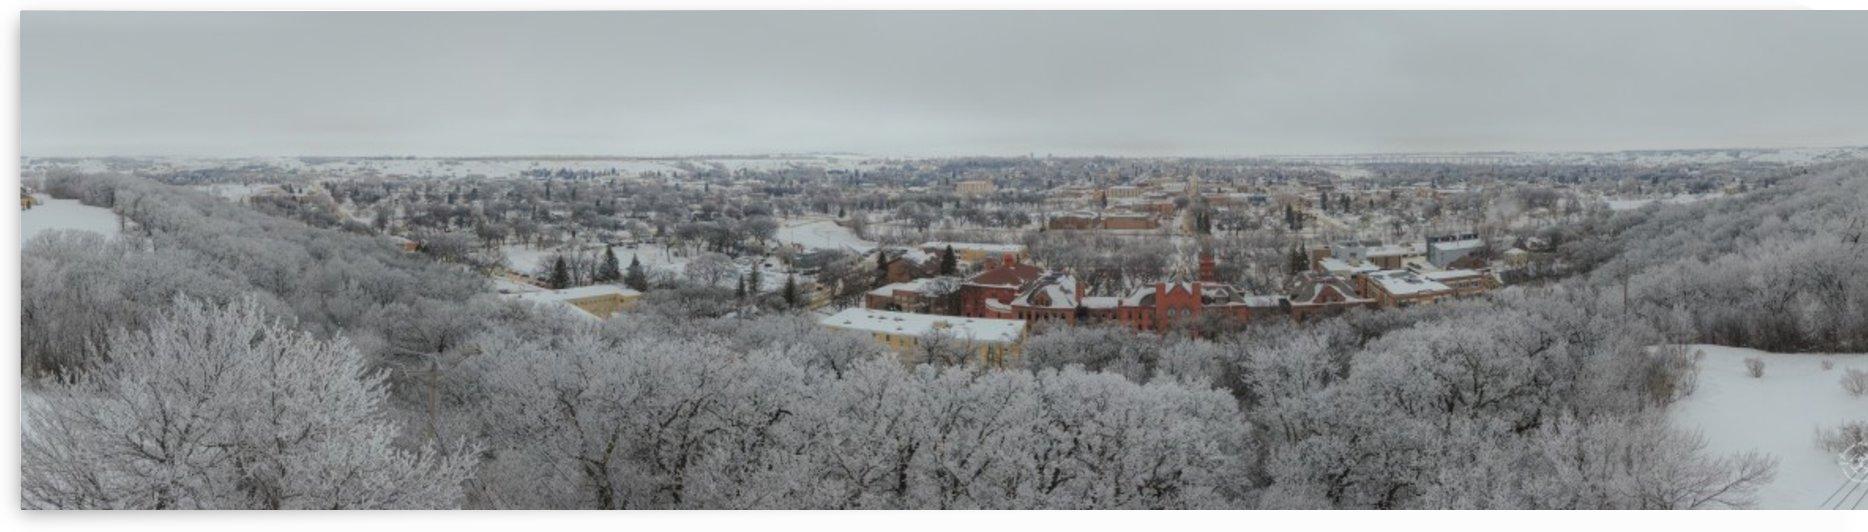 Winter Panorama of Valley City North Dakota by Jensen Air LLC